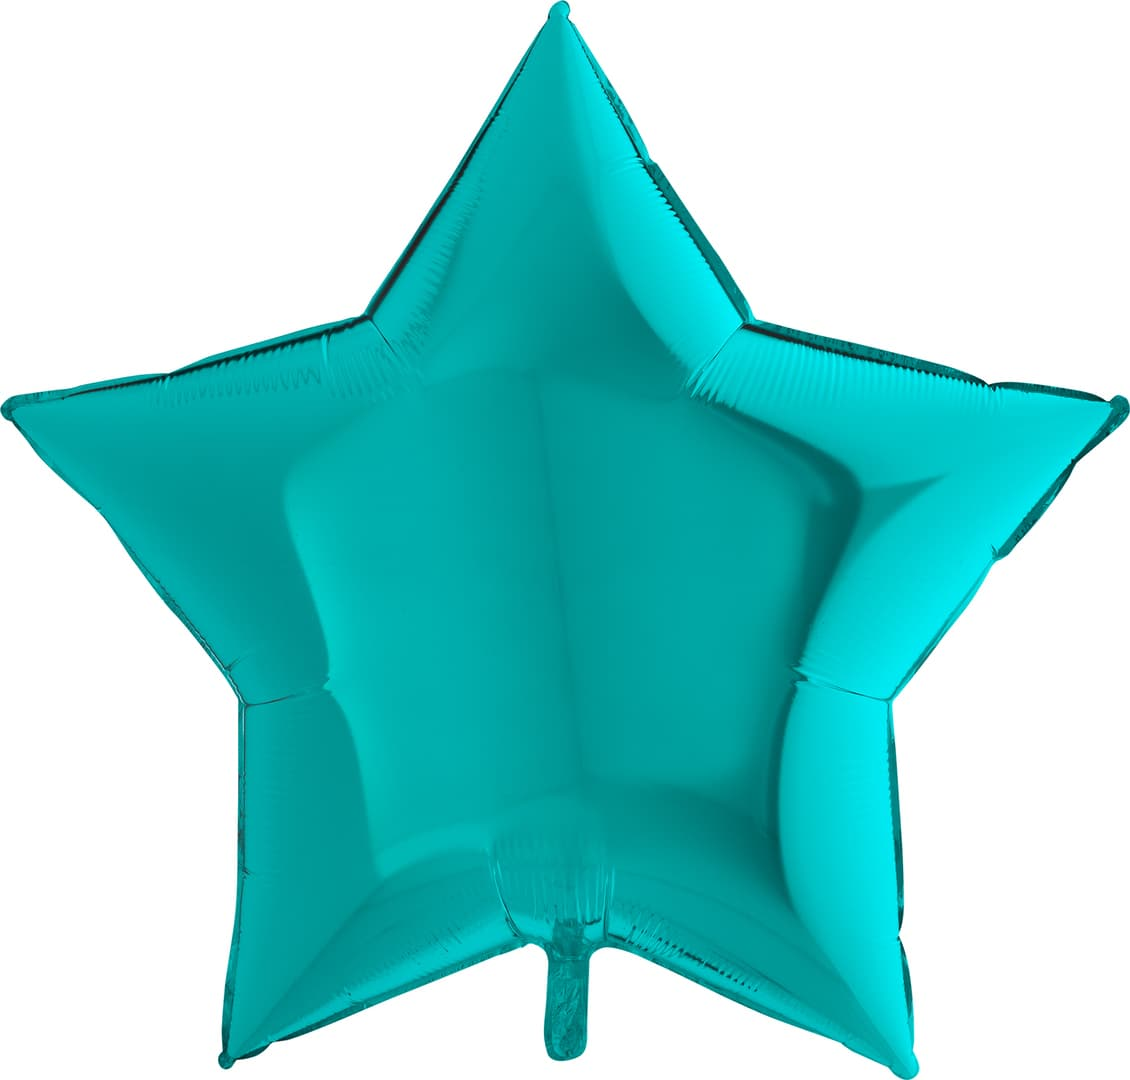 G 36 Звезда Тиффани / Star Tiffany / 1 шт /